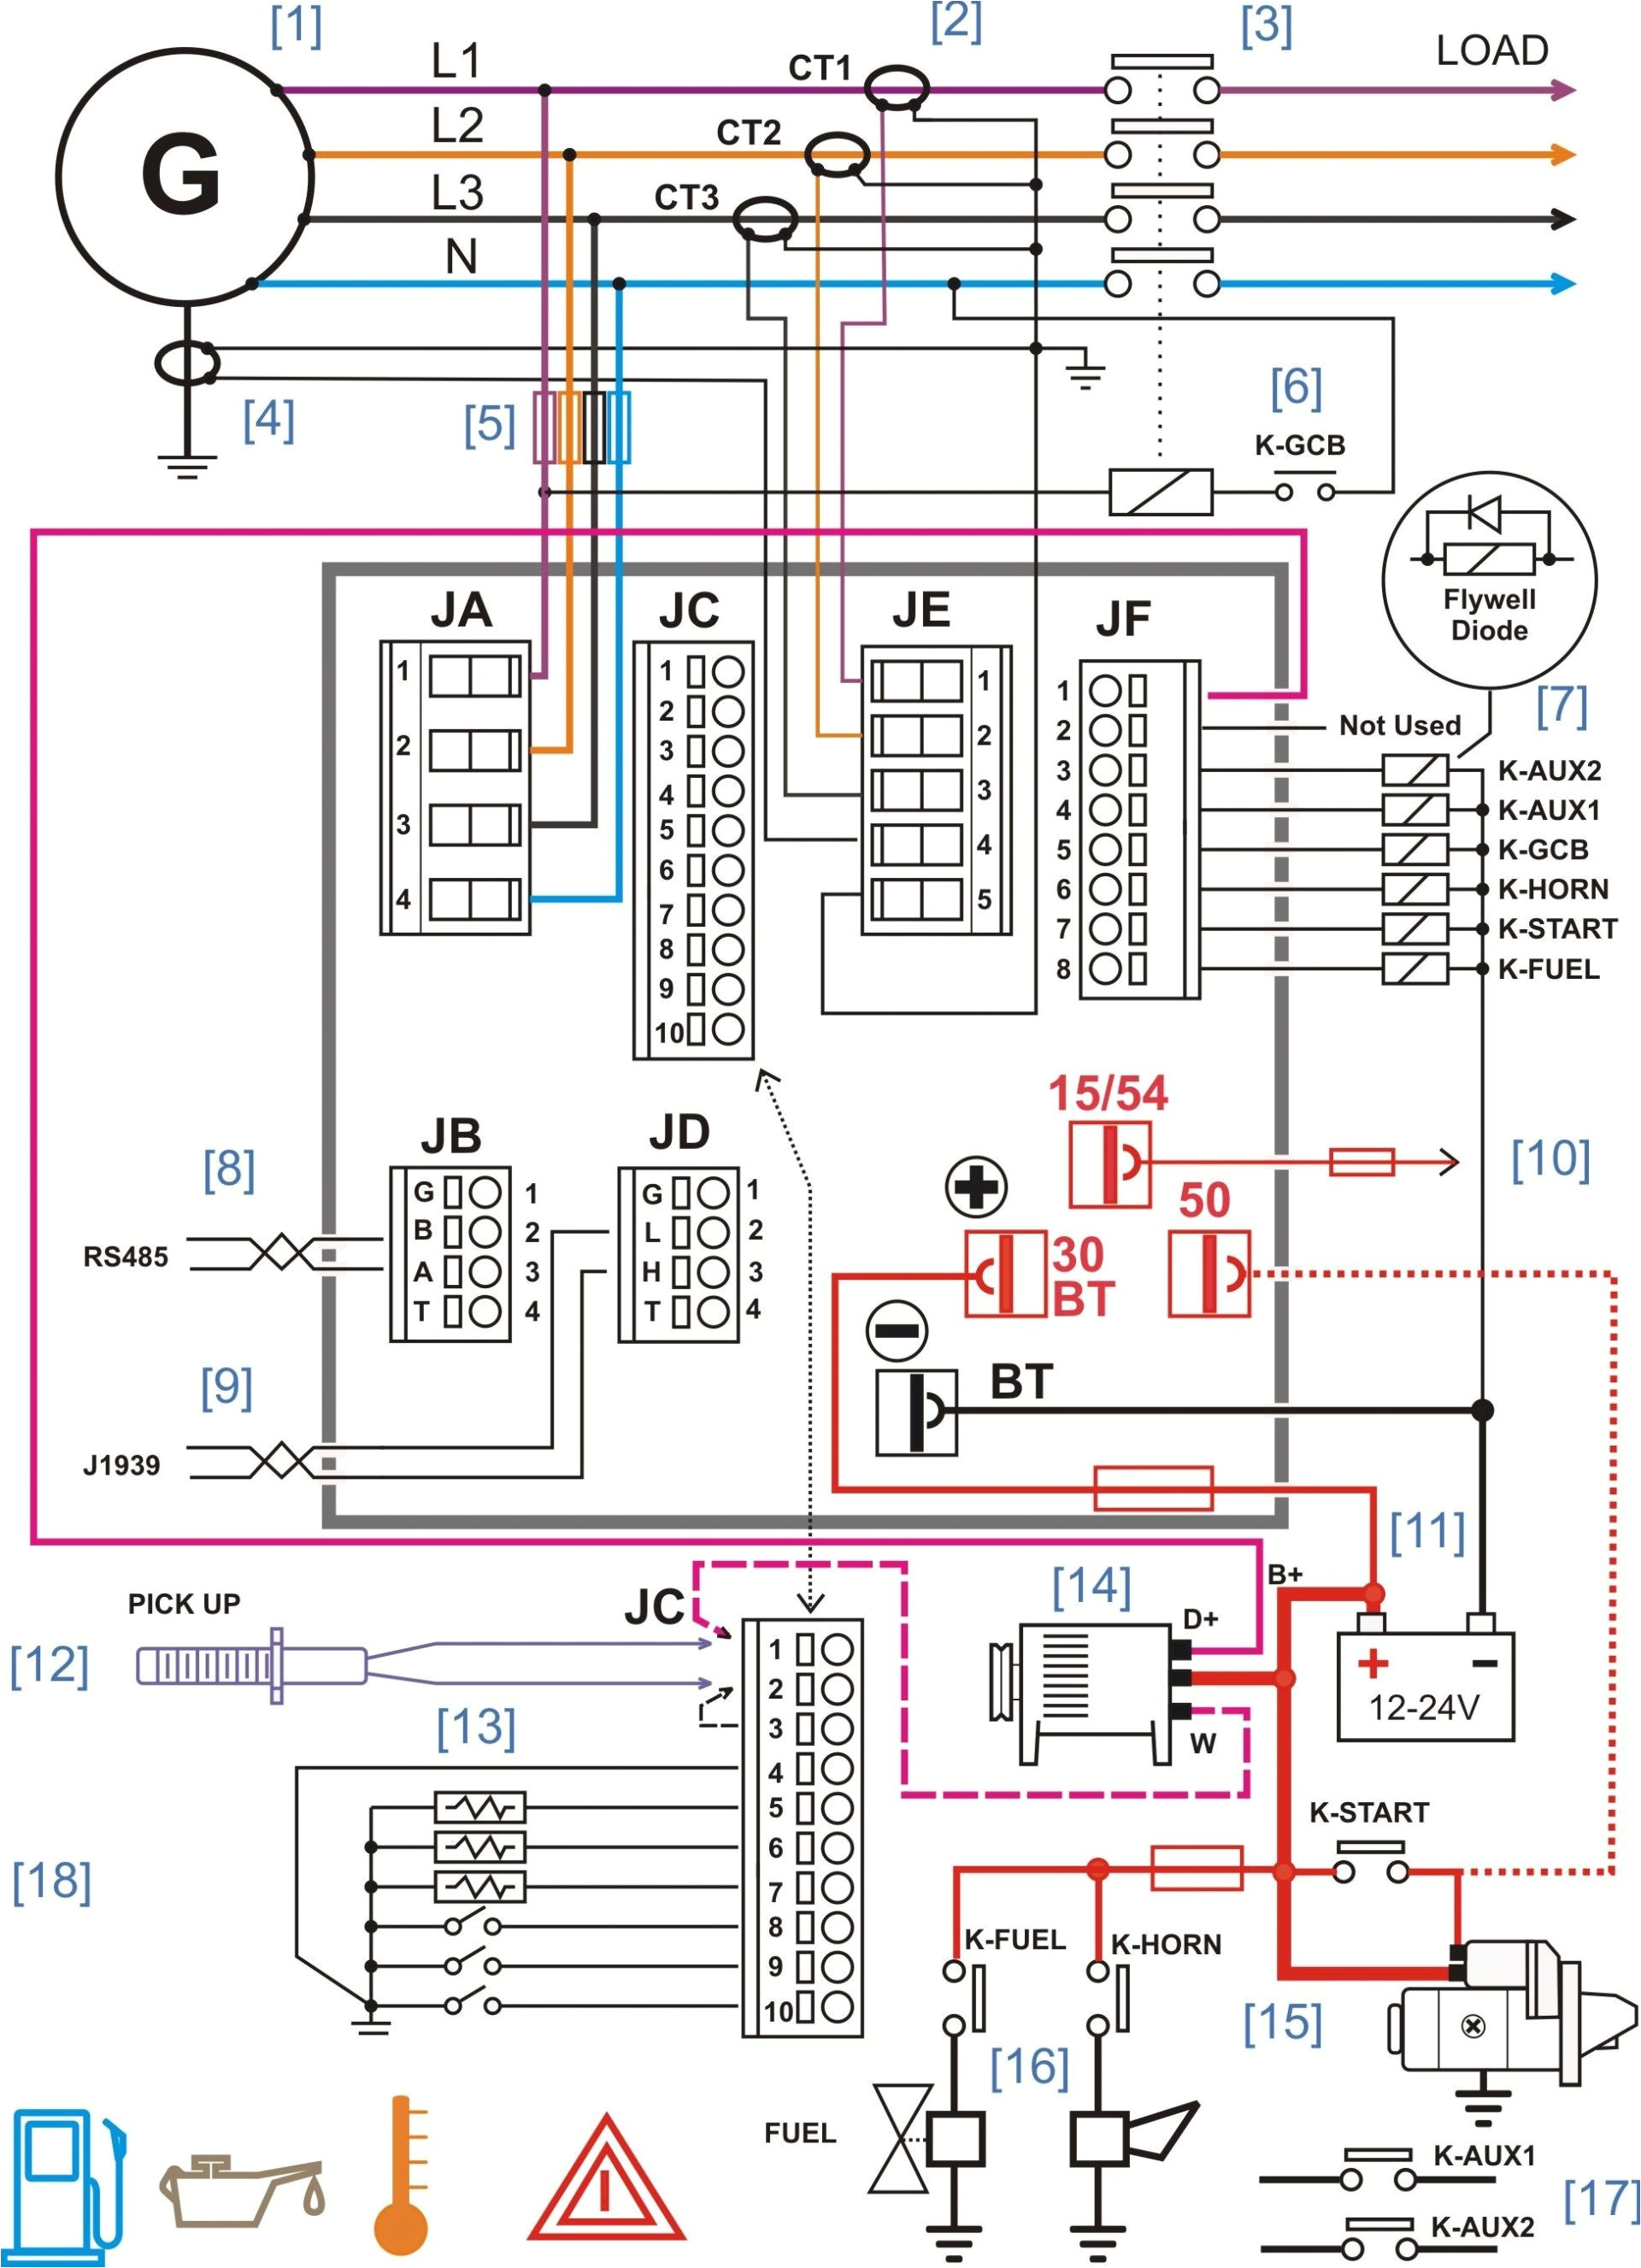 ab wiring diagrams wiring diagram ab chance wiring diagrams